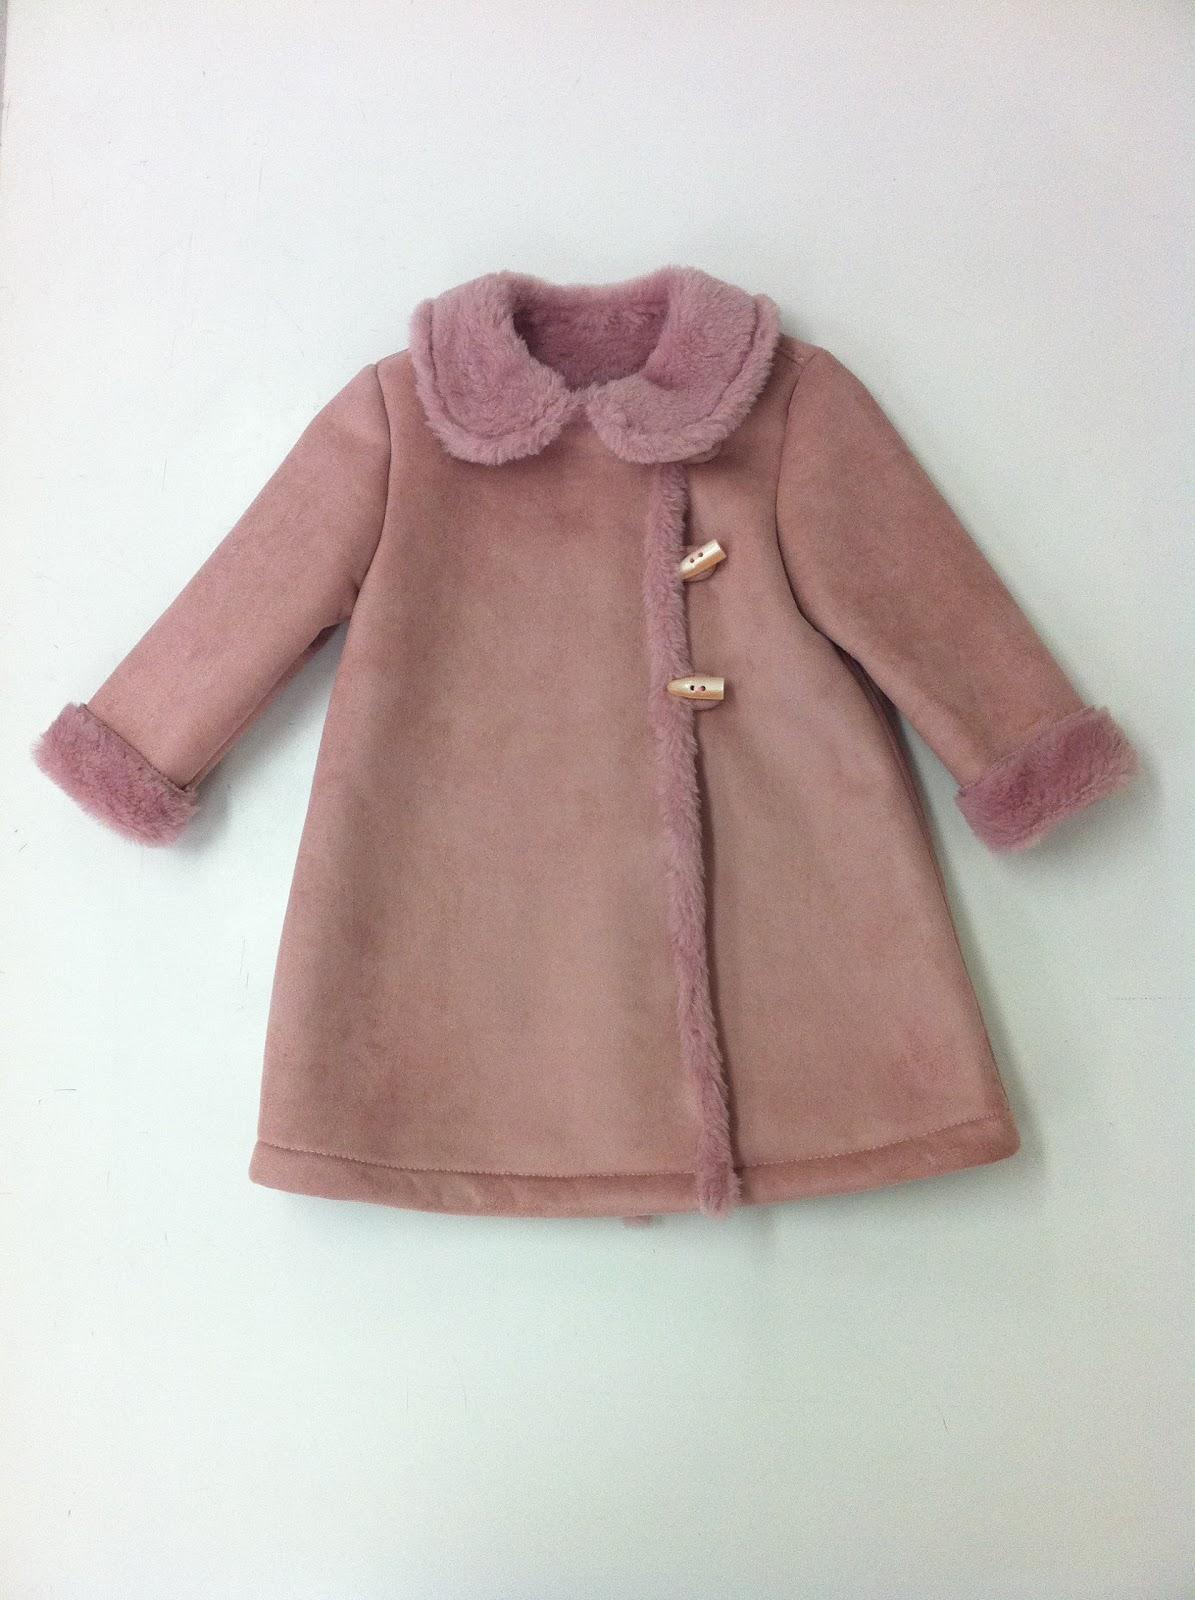 envío directo precios de remate estilos frescos Escuela de Diseño de Moda Marper: Abrigo niña